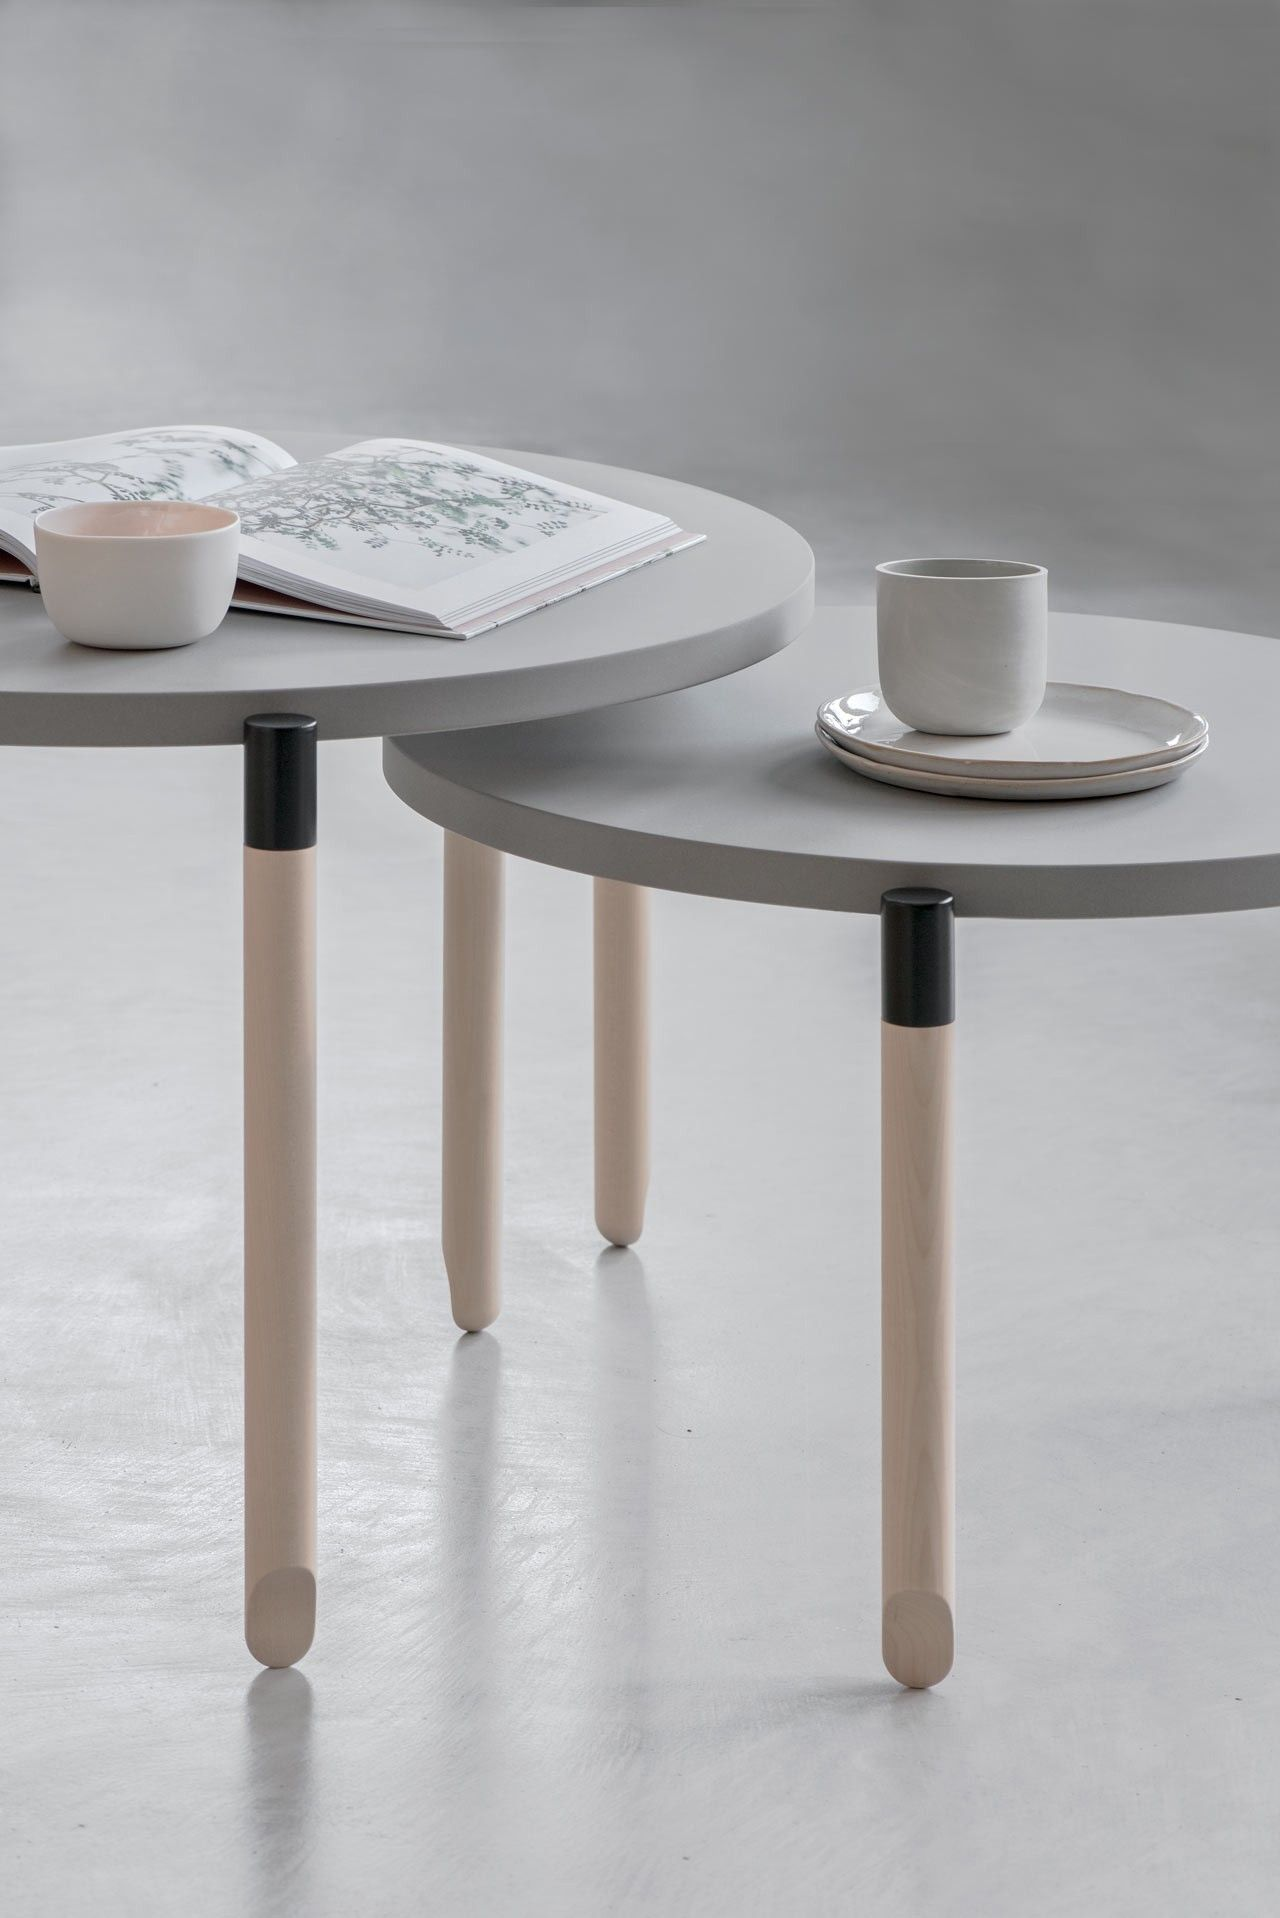 Table basse design finlandais